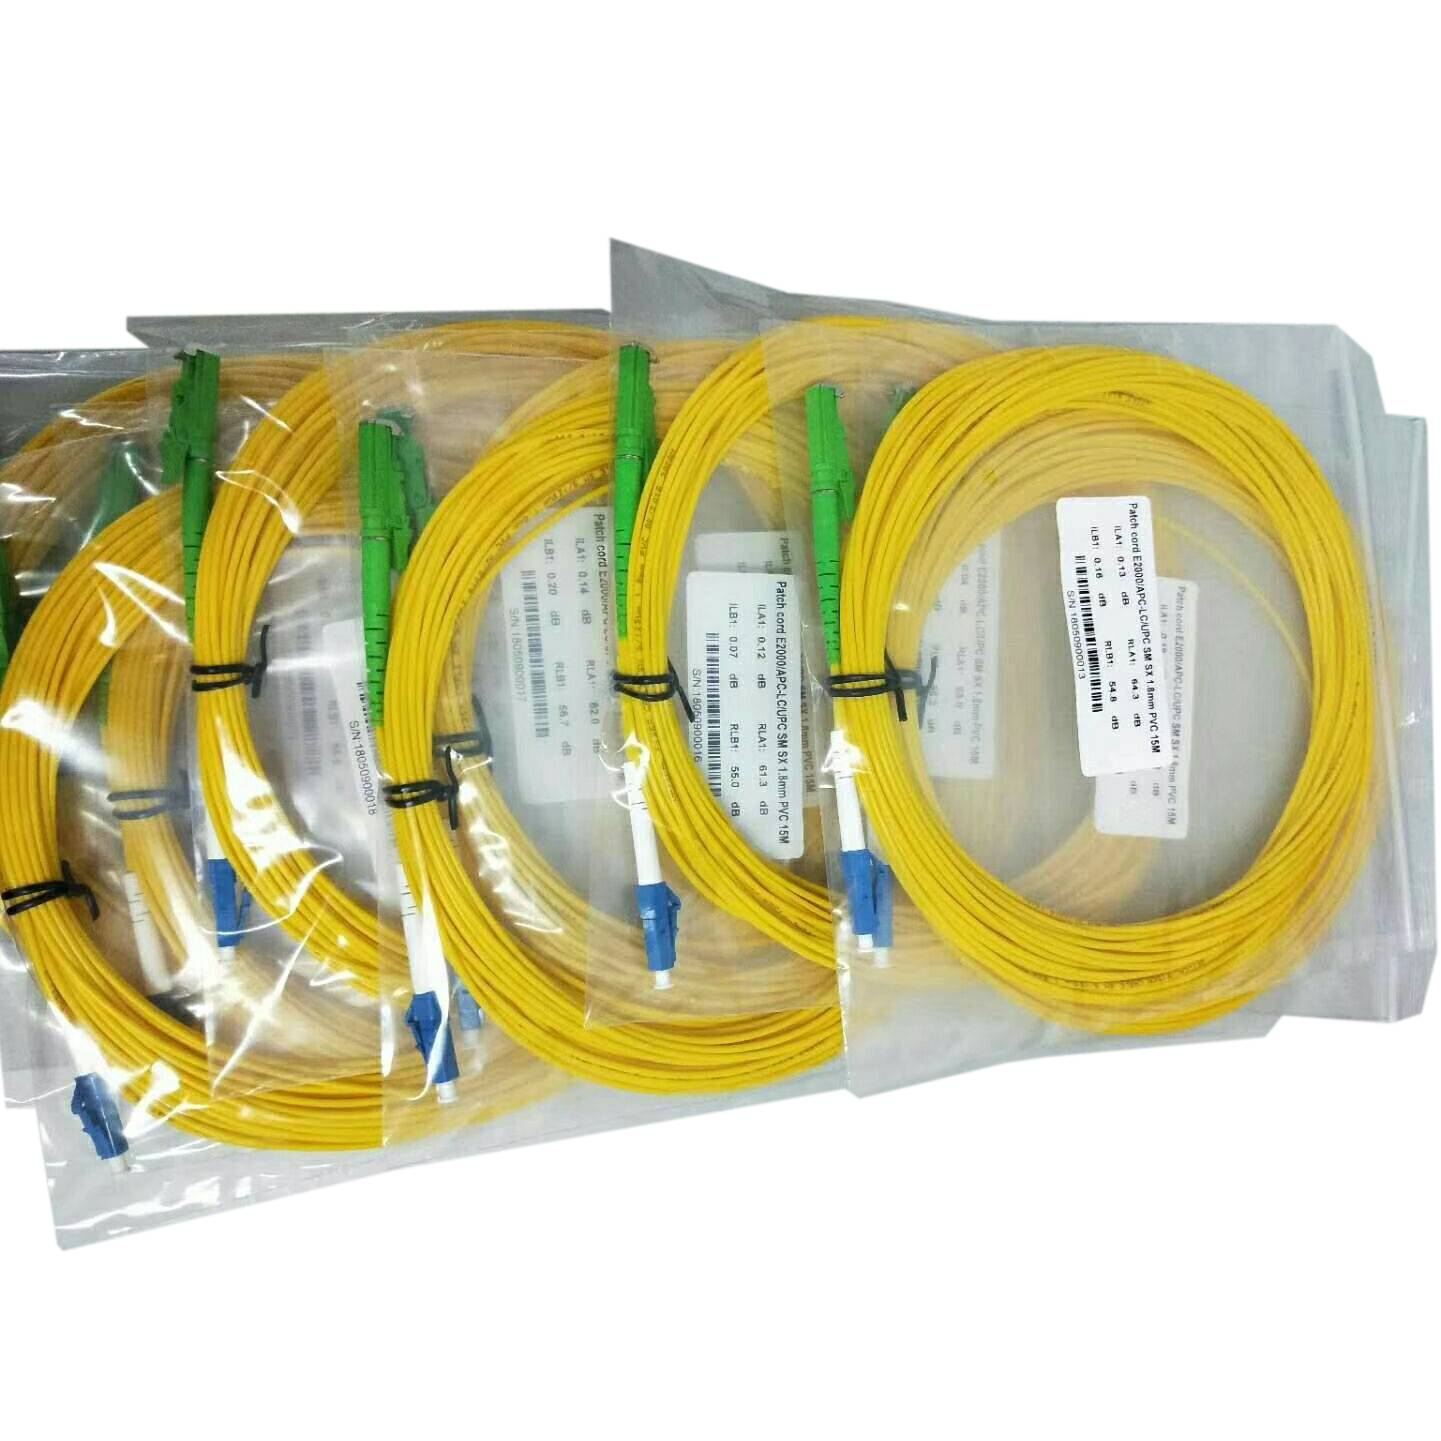 E2000 PC to LC UPC SM DX 3MM Fiber optic patch cord